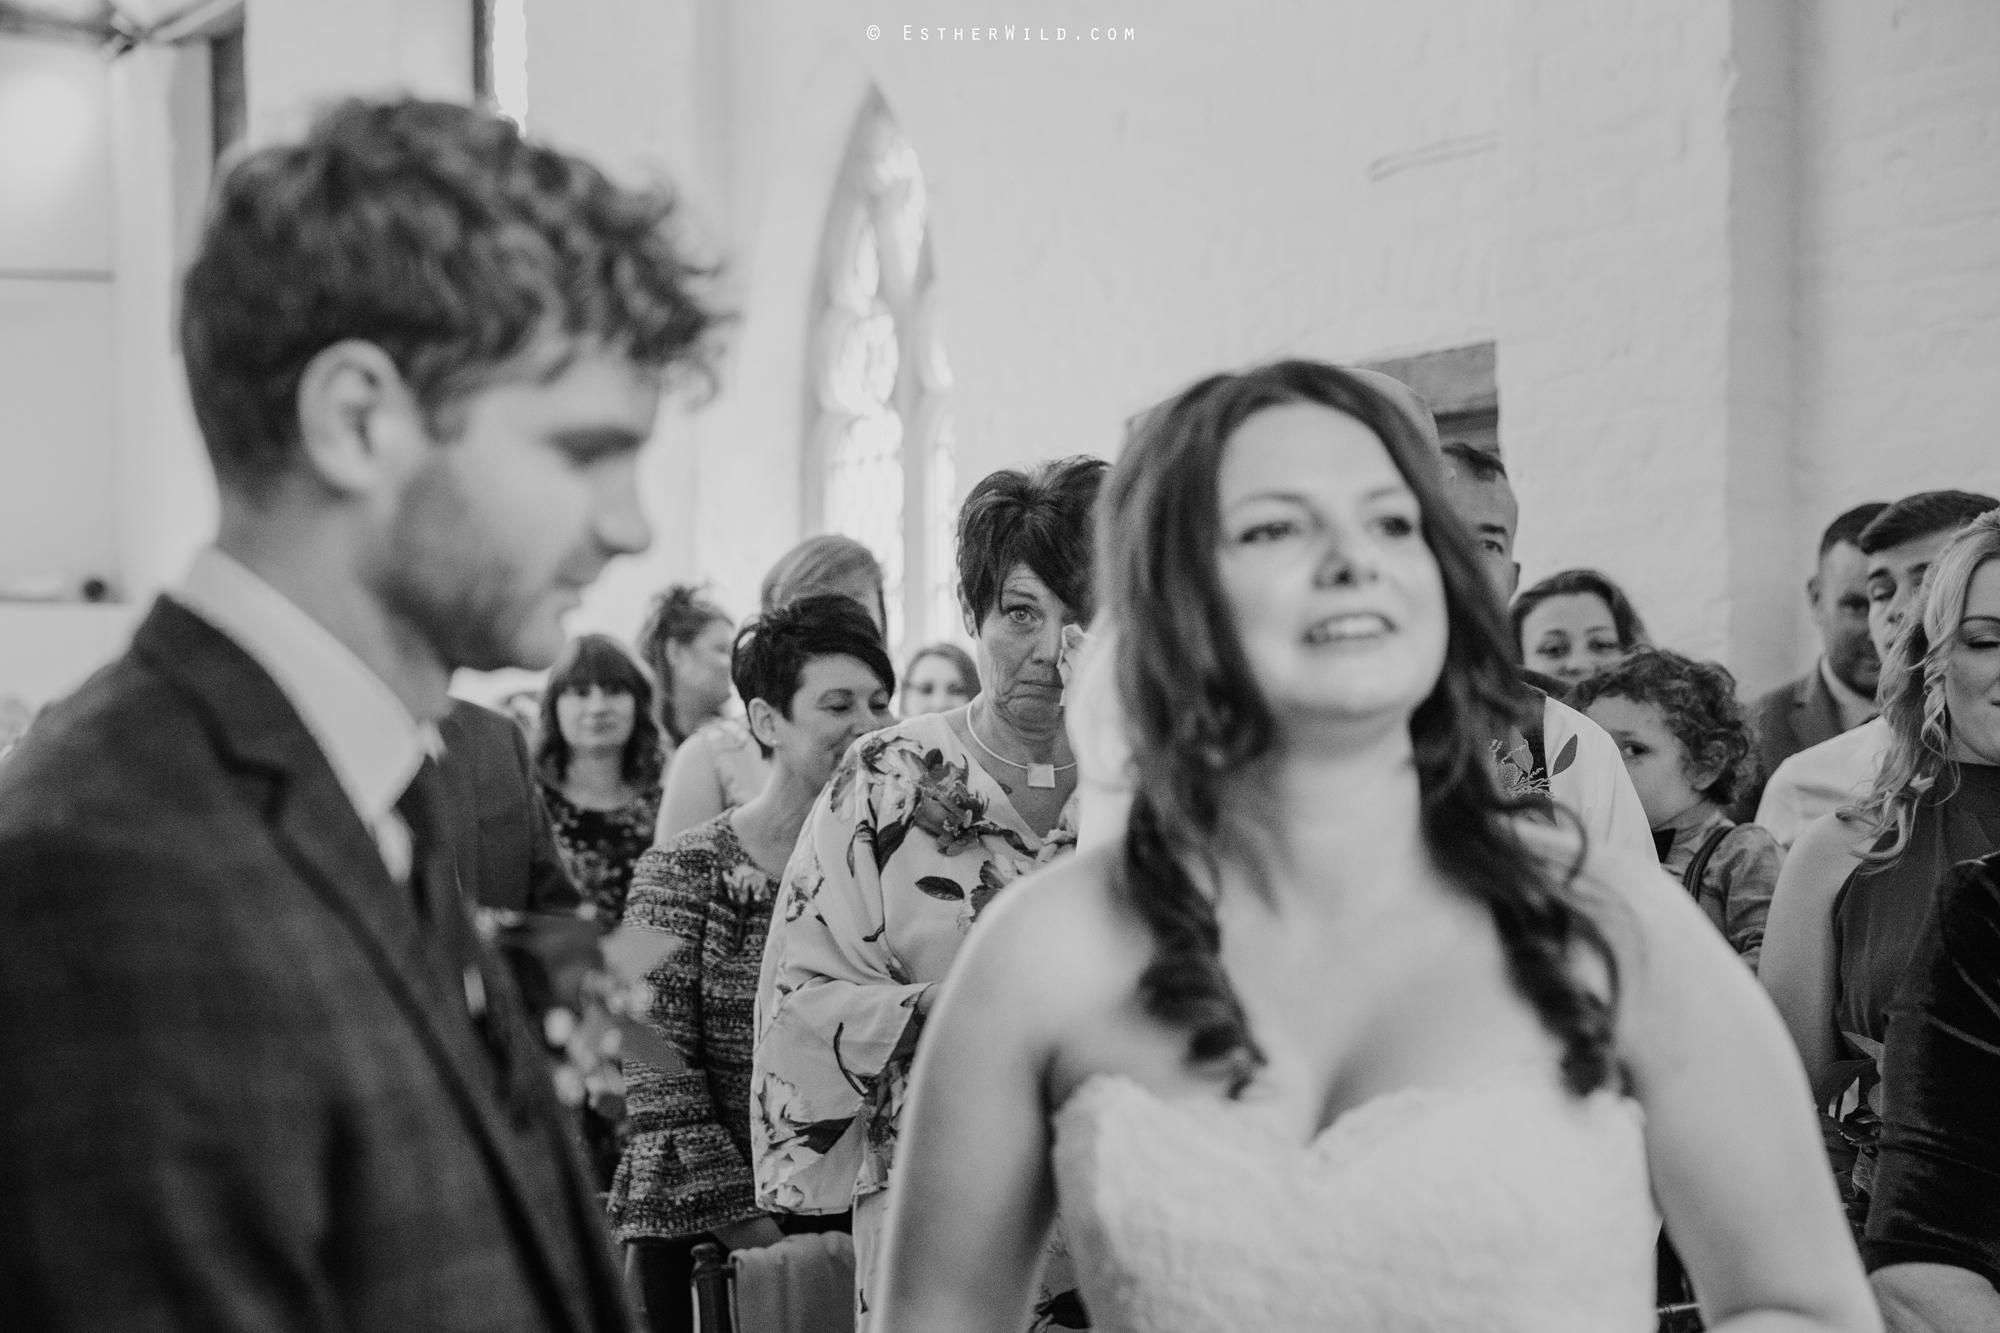 Reading_Room_Weddings_Alby_Norwich_Photographer_Esther_Wild_IMG_0861-1.jpg